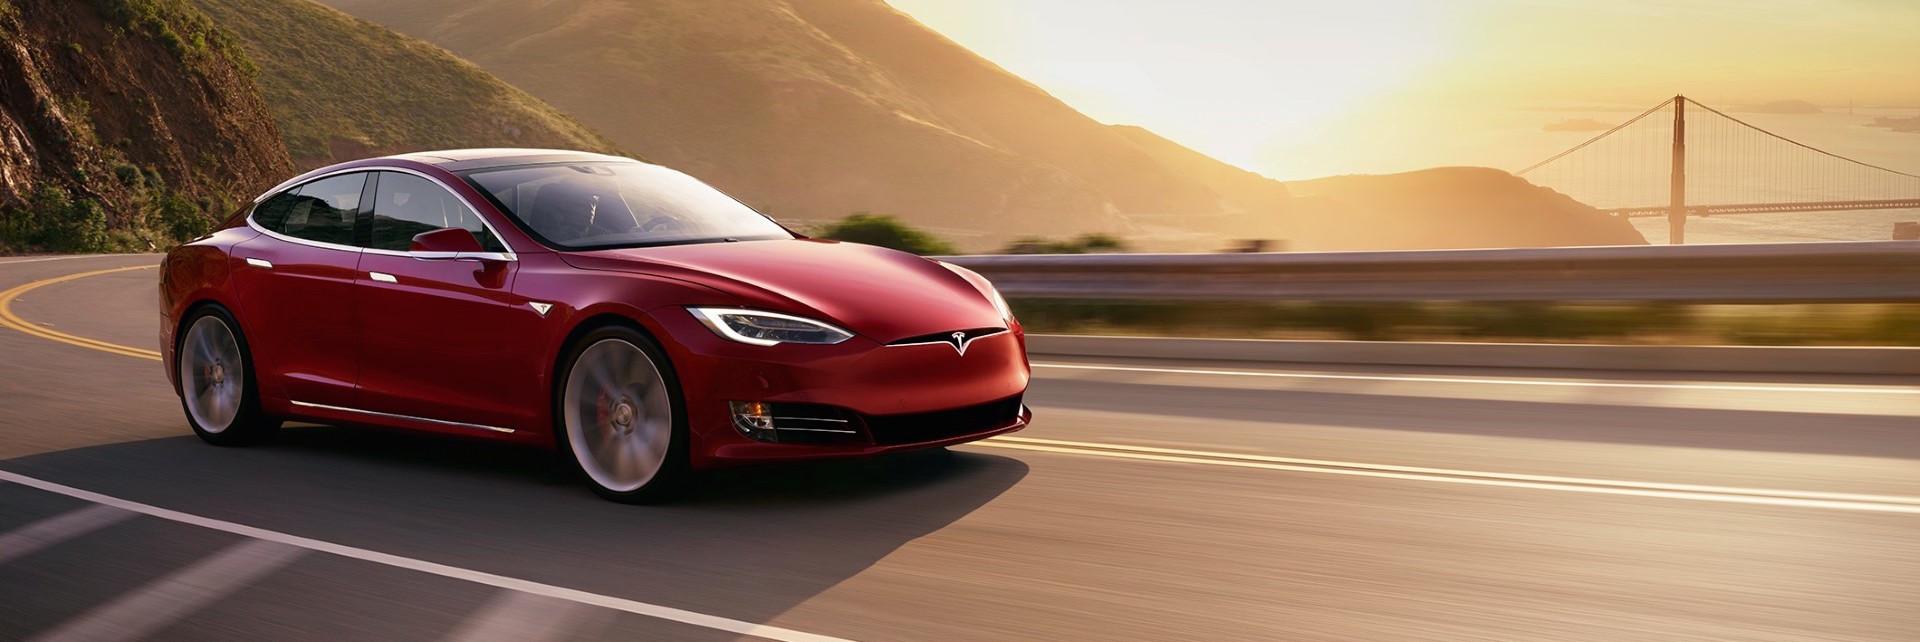 Charging A Tesla Model S 75